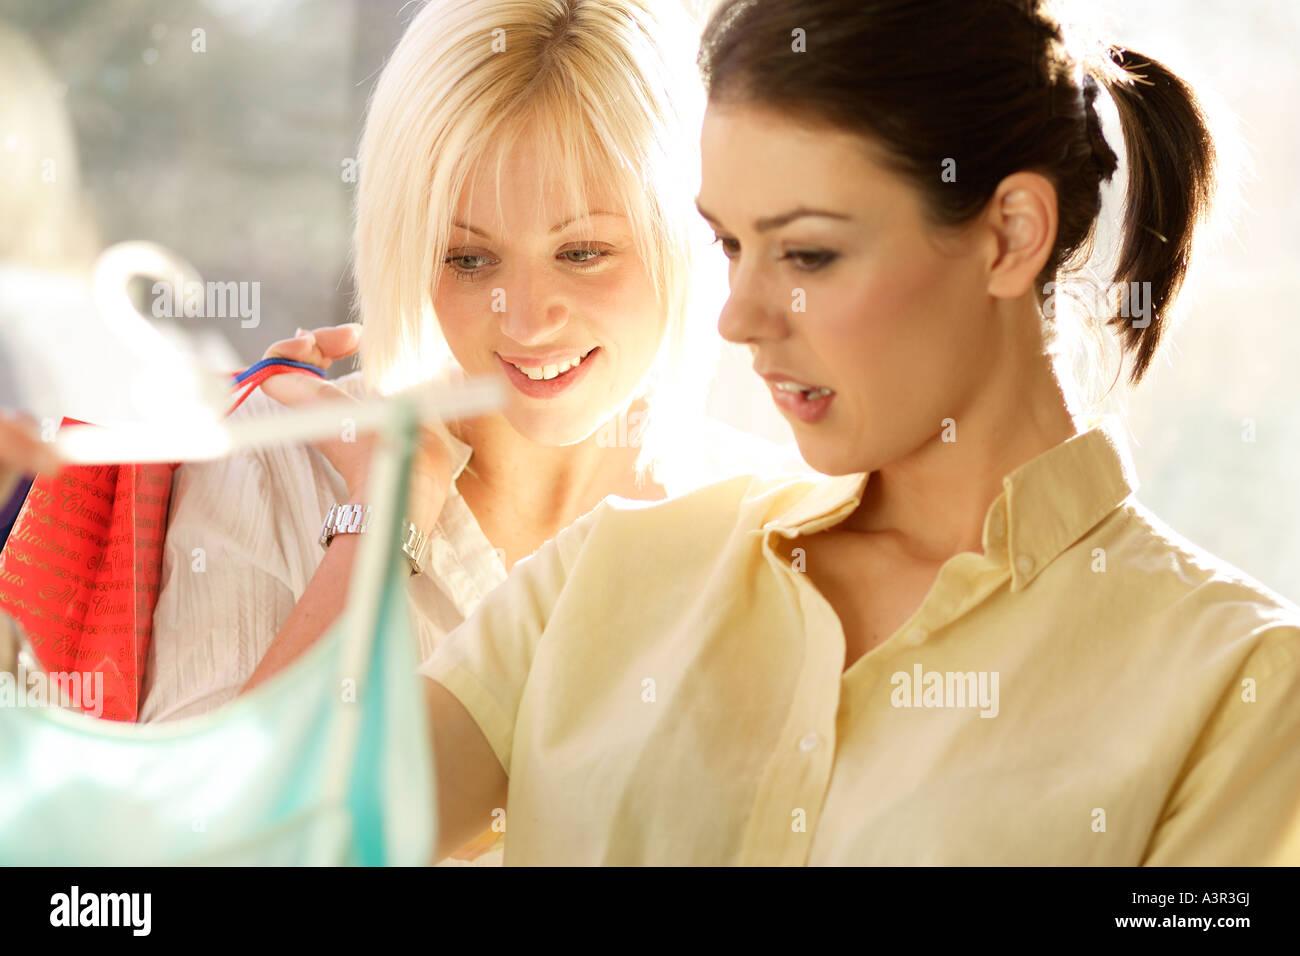 Two girls shopping - Stock Image